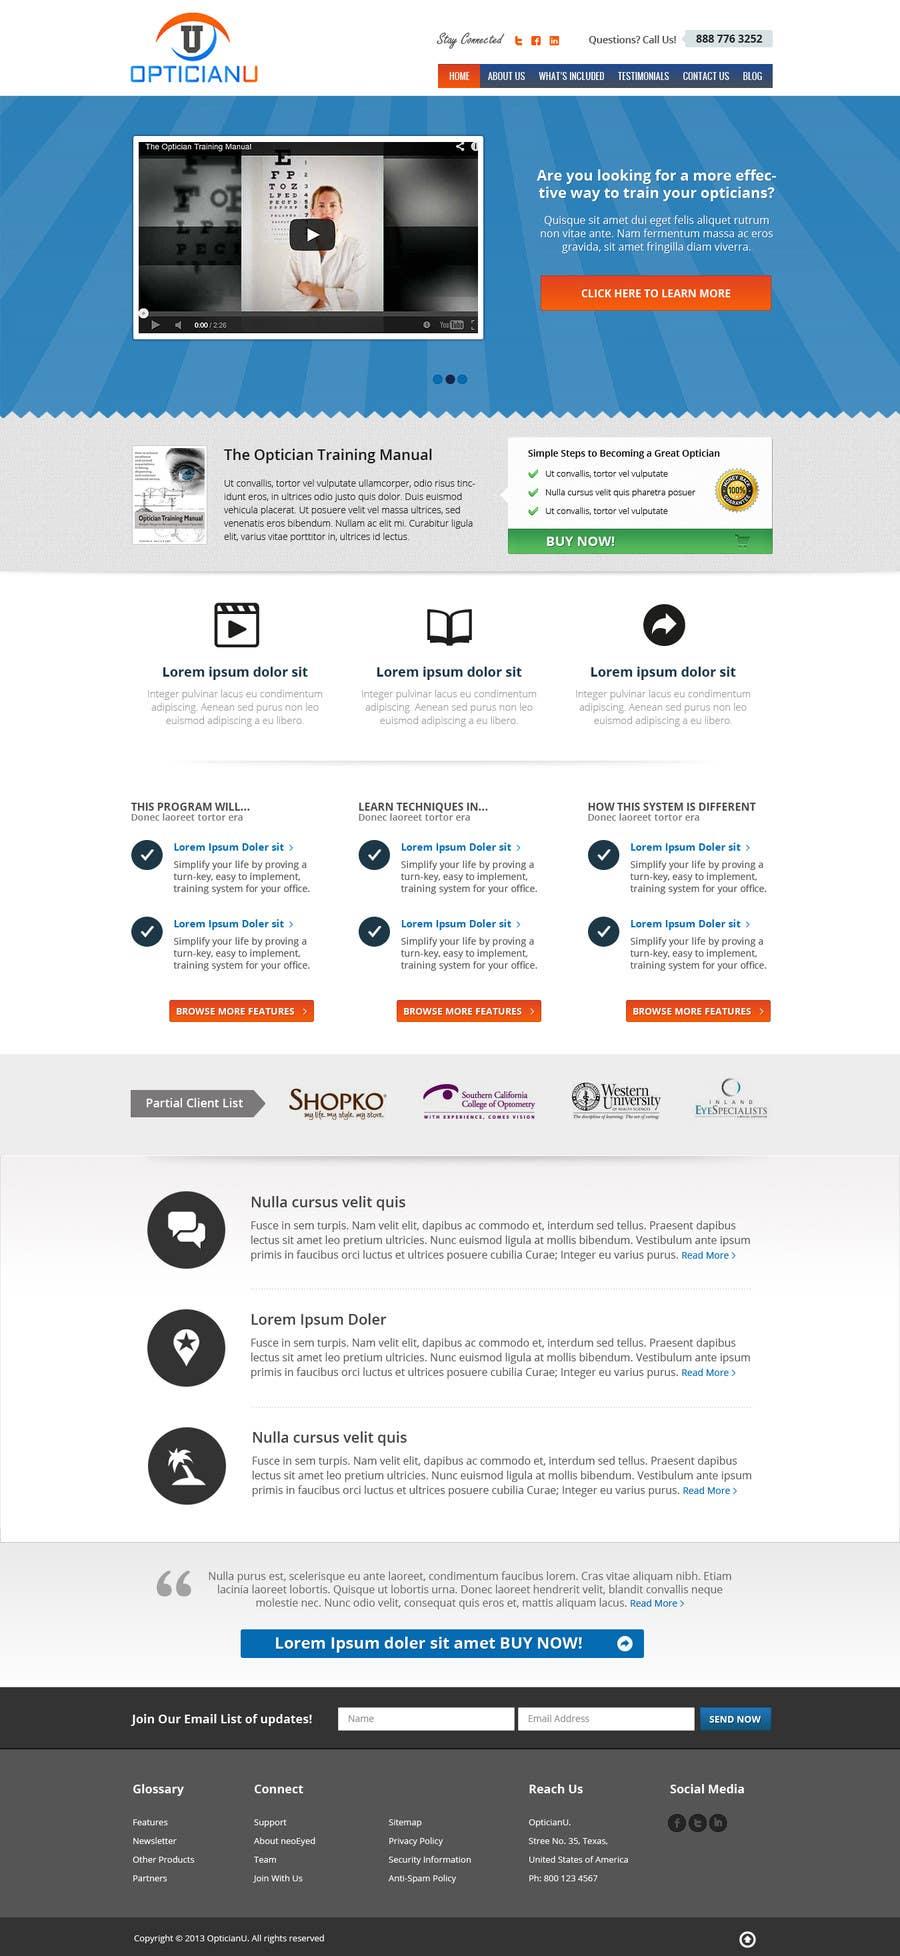 Penyertaan Peraduan #                                        5                                      untuk                                         Design a Website Mockup for www.OpticianTraining.com